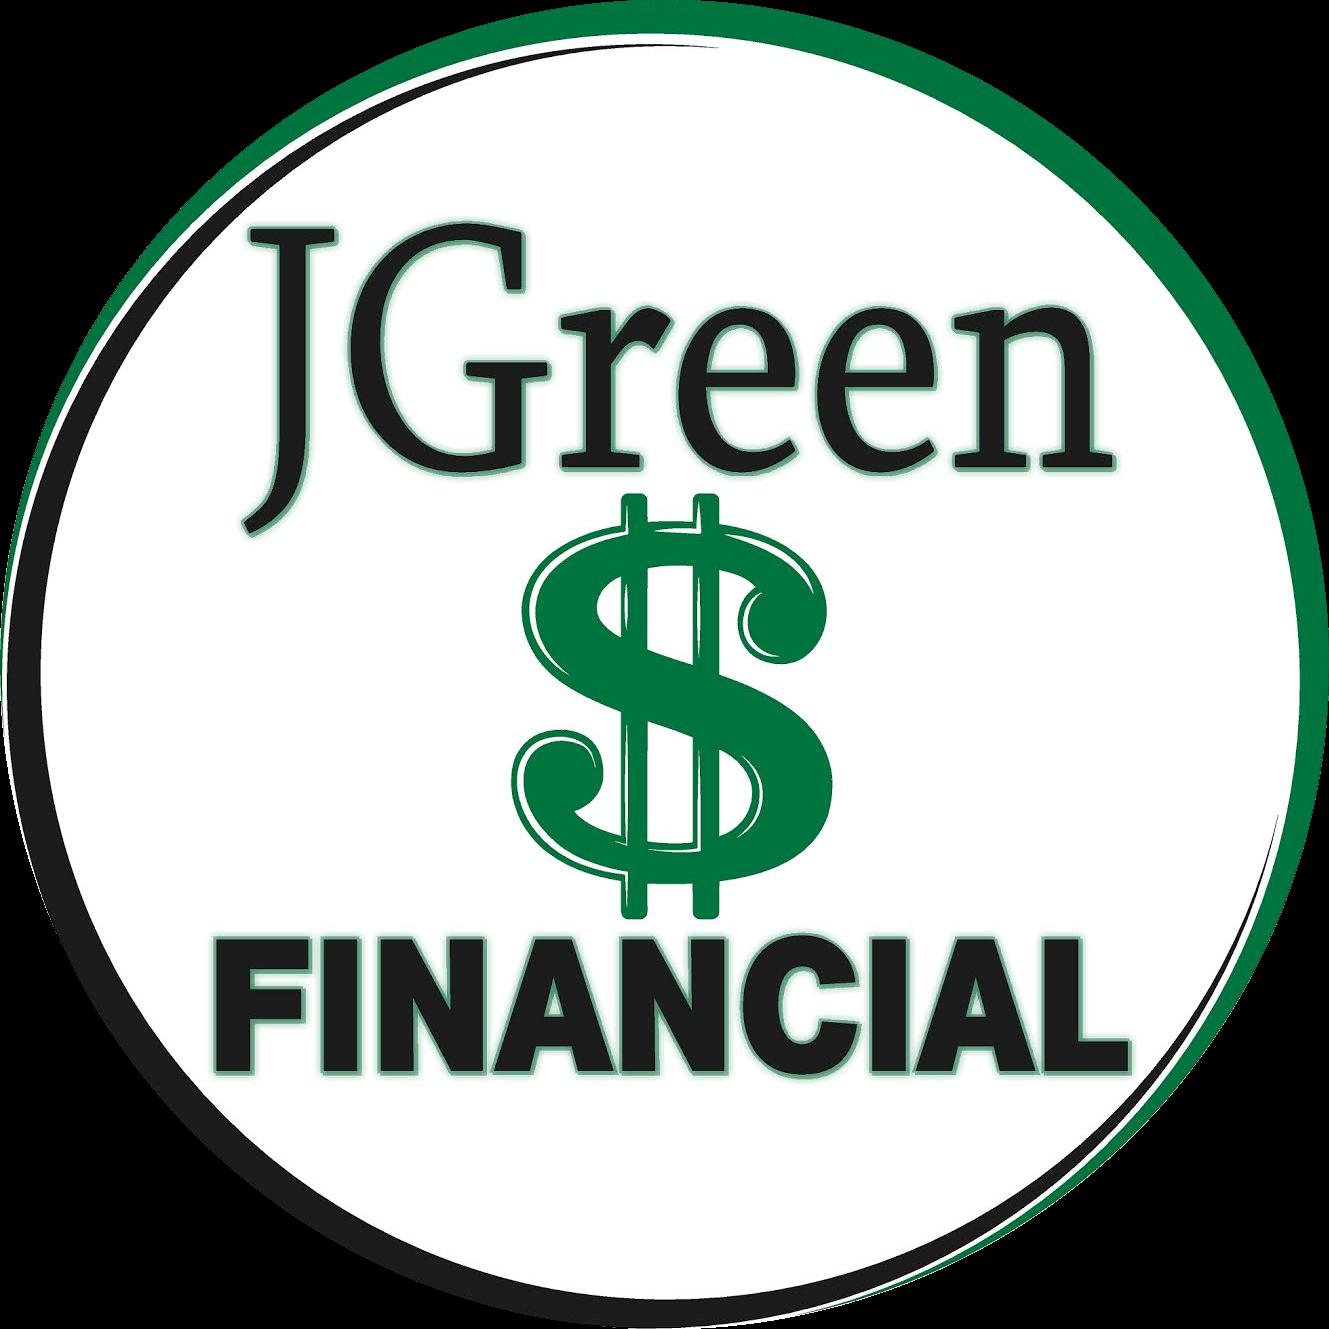 JGreen Financial Logo